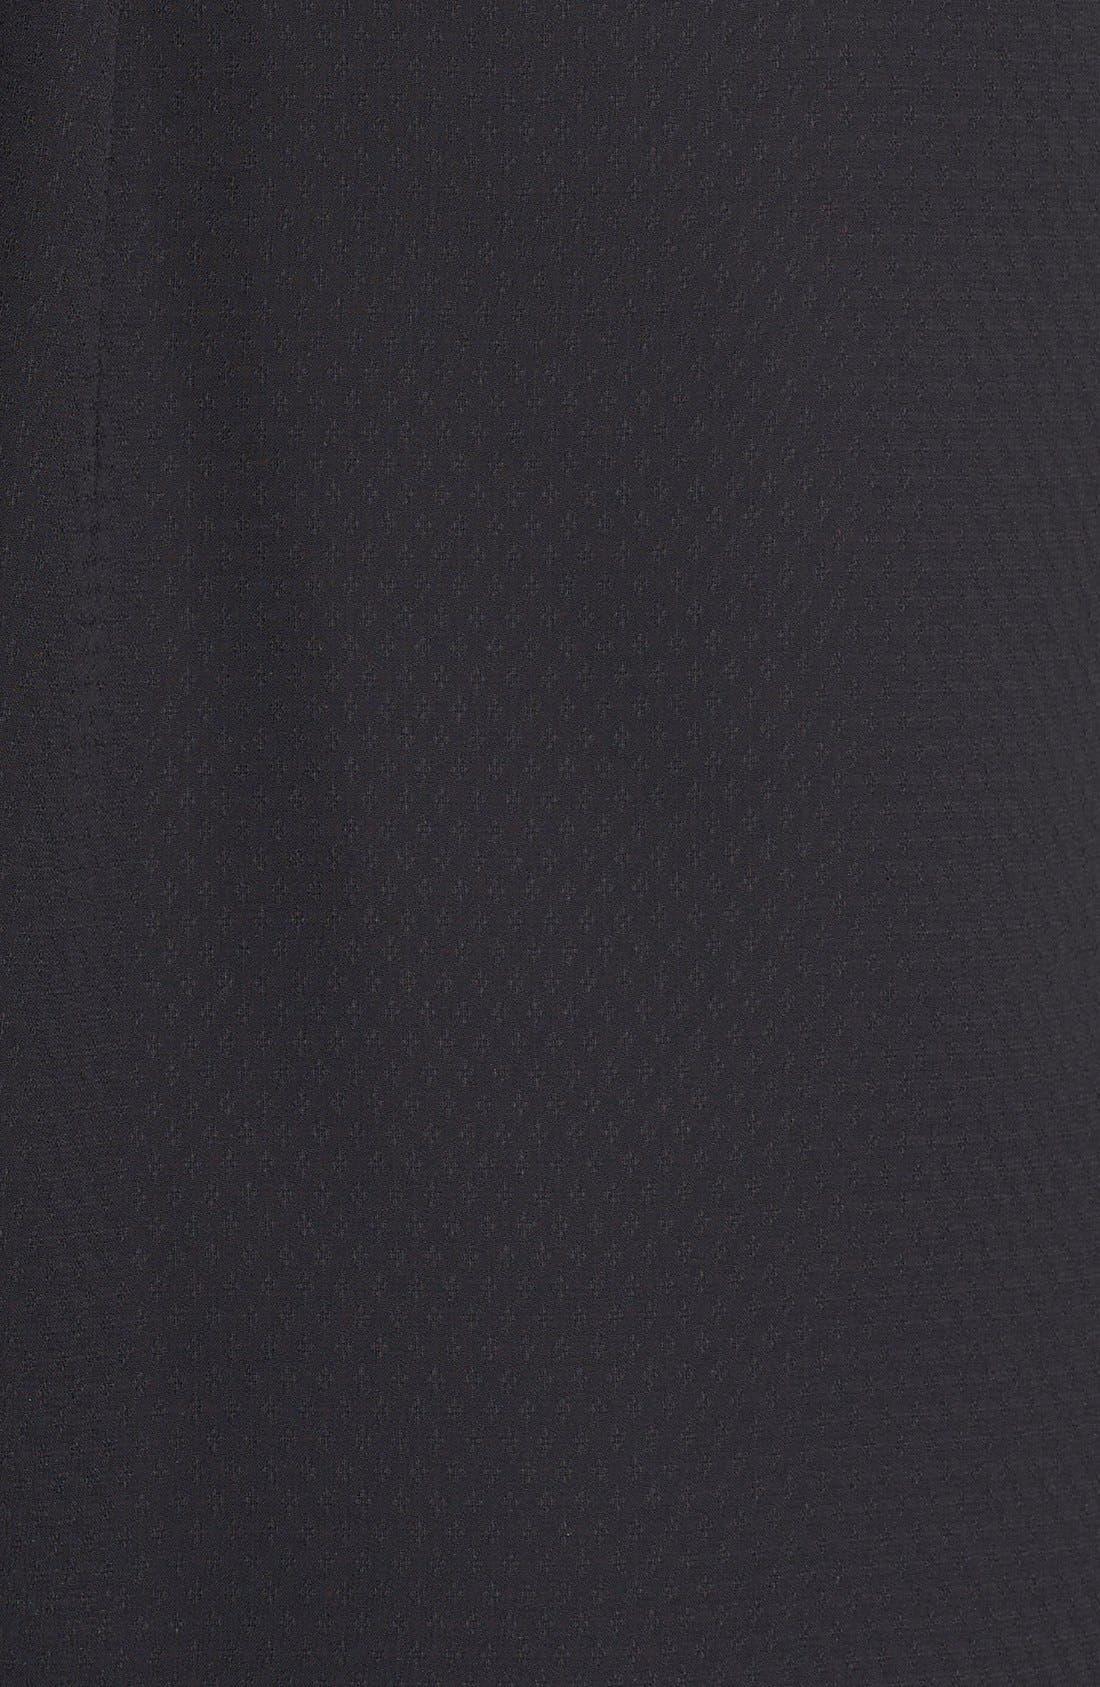 Alternate Image 3  - Jessica Simpson 'Carmela' Stripe Sleeveless Blouse (Plus Size)